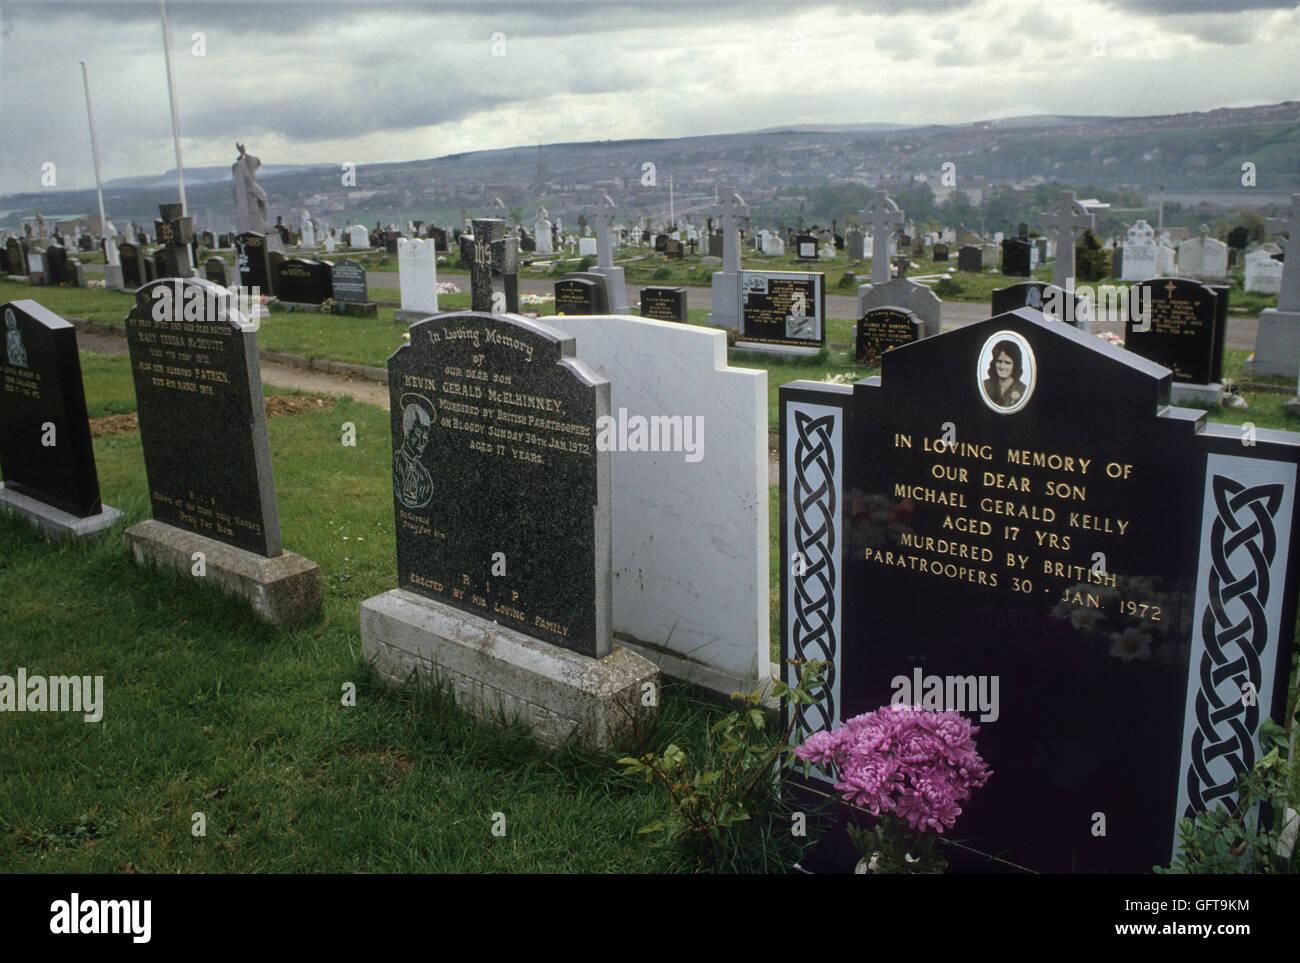 Hugh Pius Gilmour, Patrick Joseph Doherty, William Noel Nash. Murdered by British Paratroopers Bloody Sunday 1972. - Stock Image